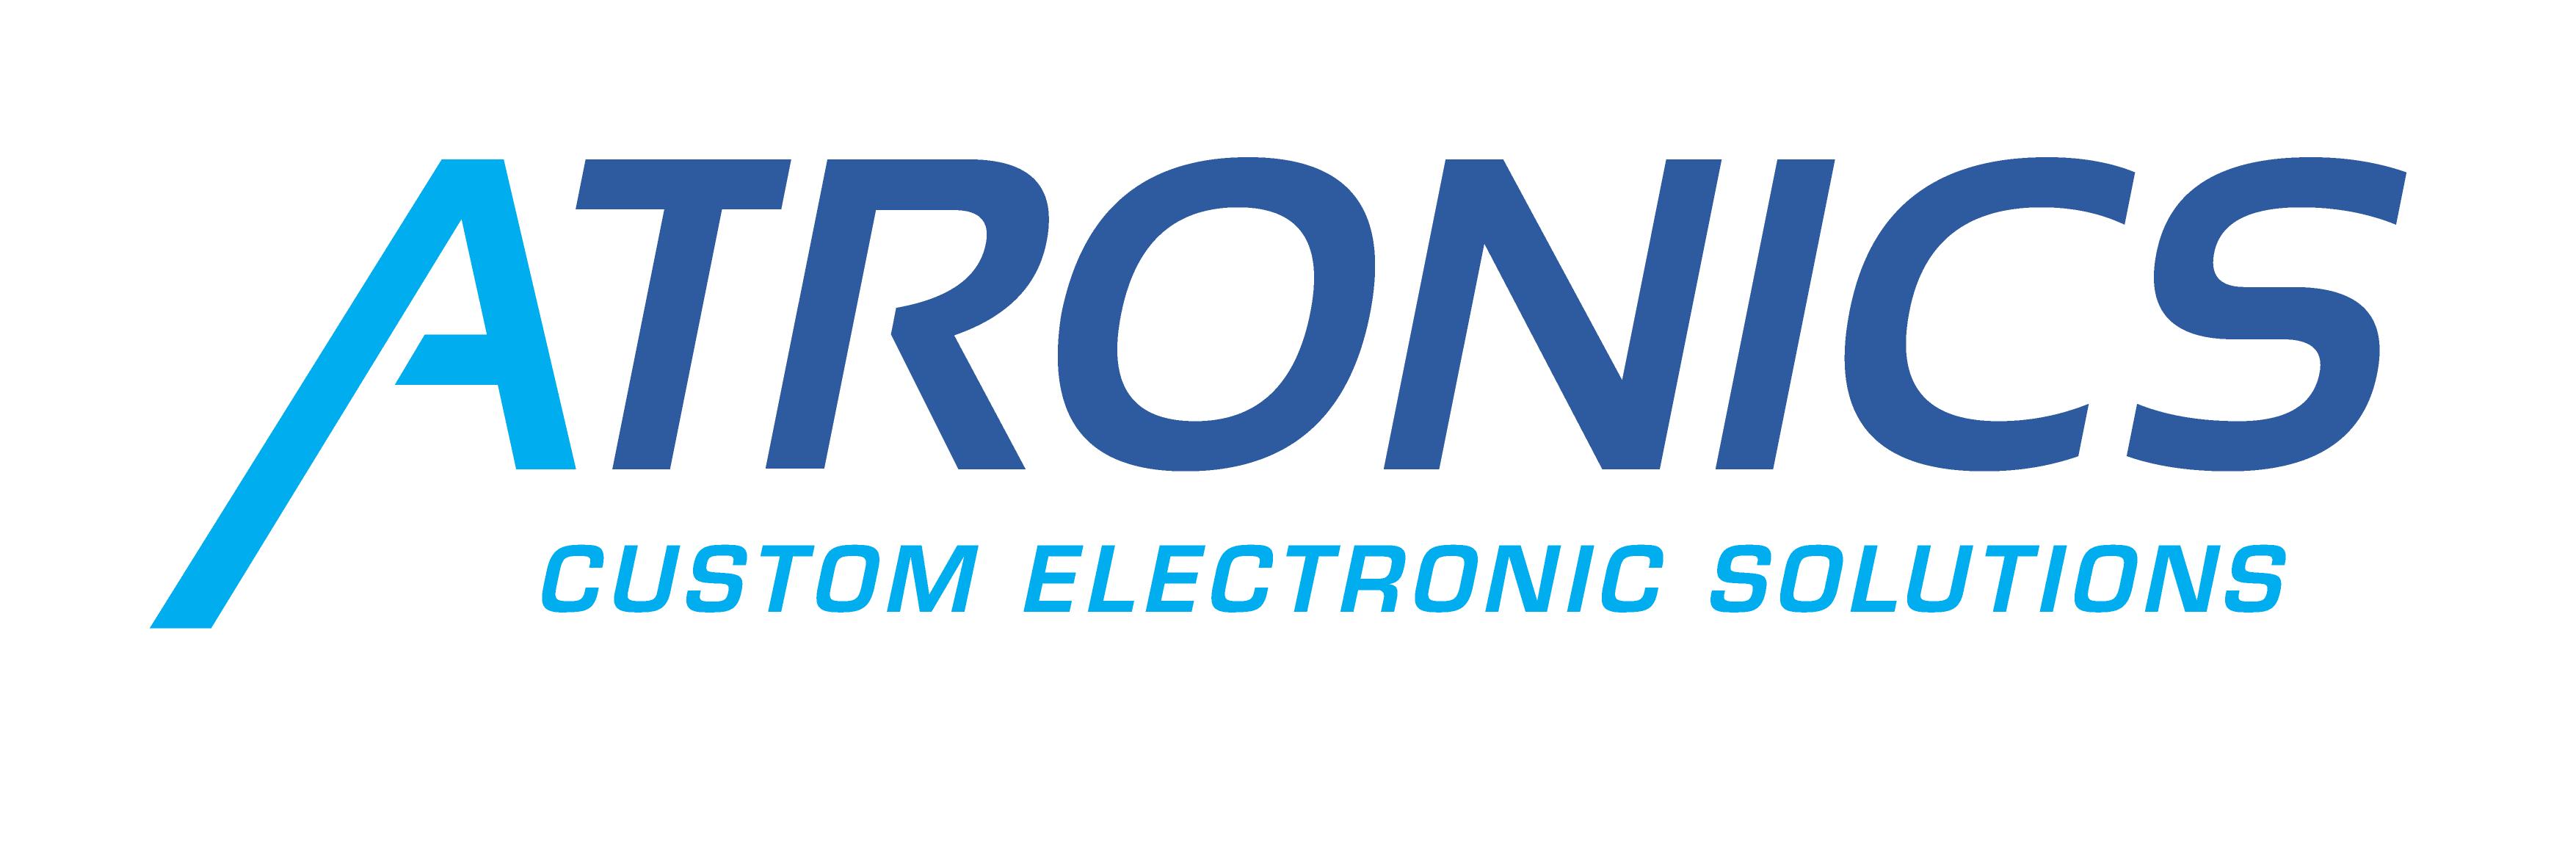 atronics-logo-01